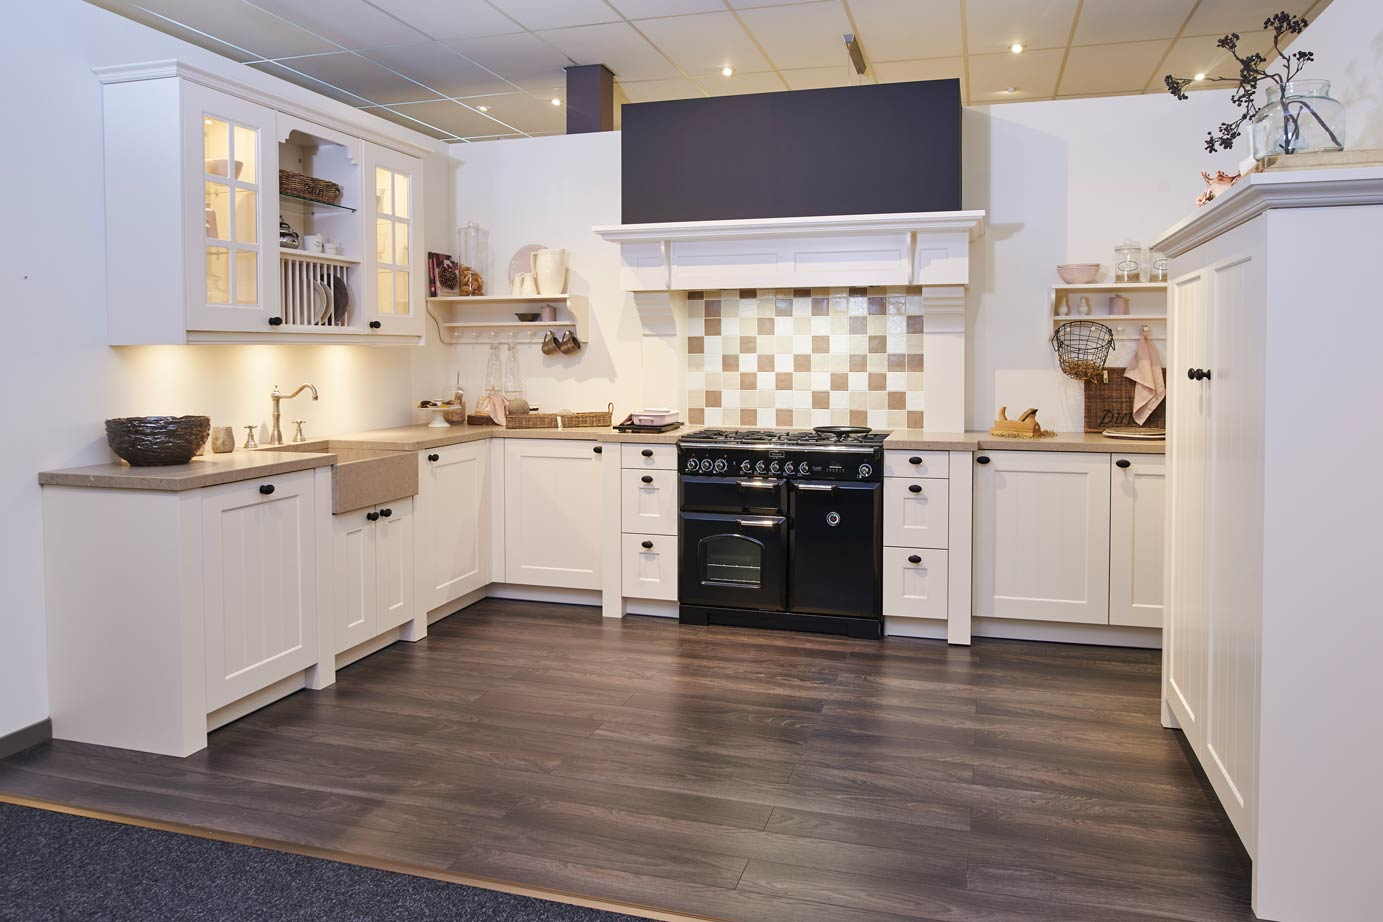 Landelijke Keukens Dampkap : Grote landelijke keuken met Falcon fornuis DB Keukens